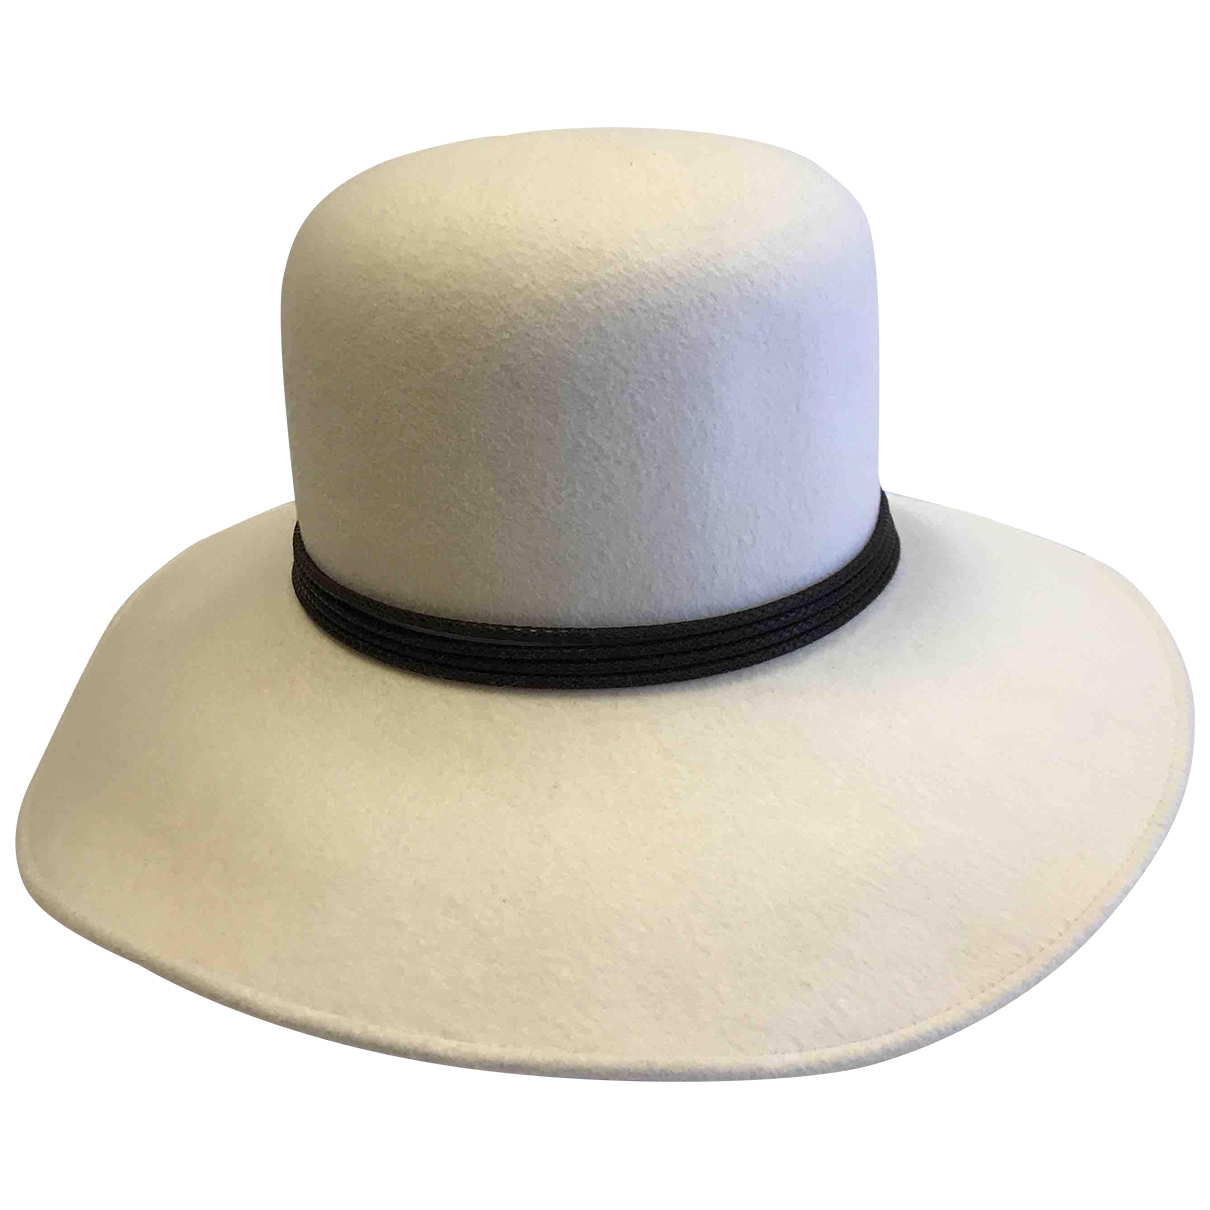 Borsalino \N White Wool hat for Women M International